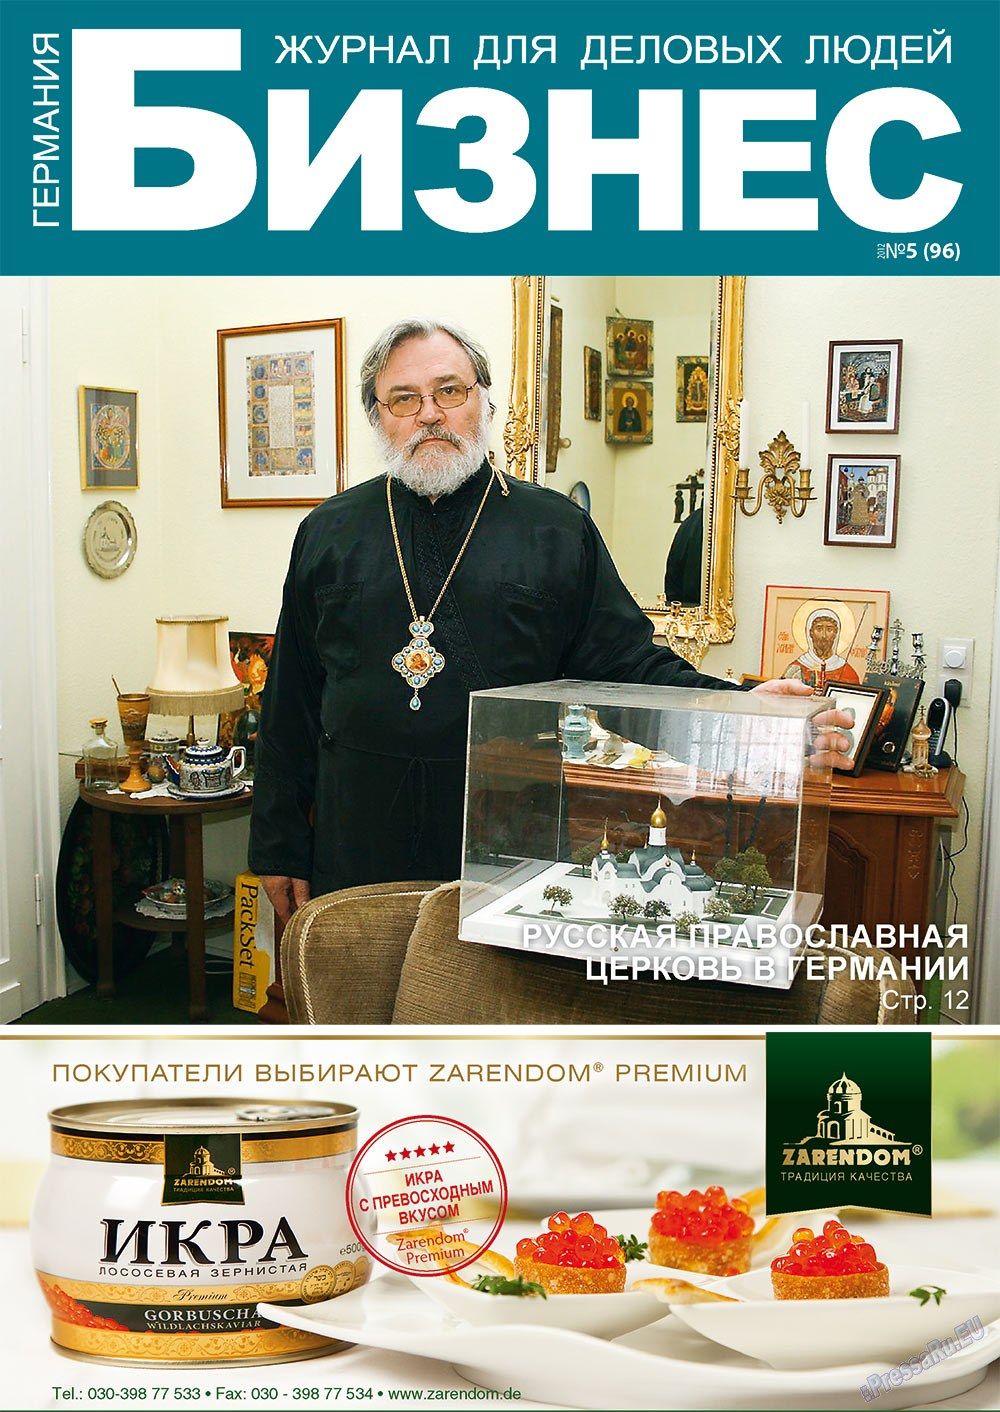 Бизнес (журнал). 2012 год, номер 5, стр. 1